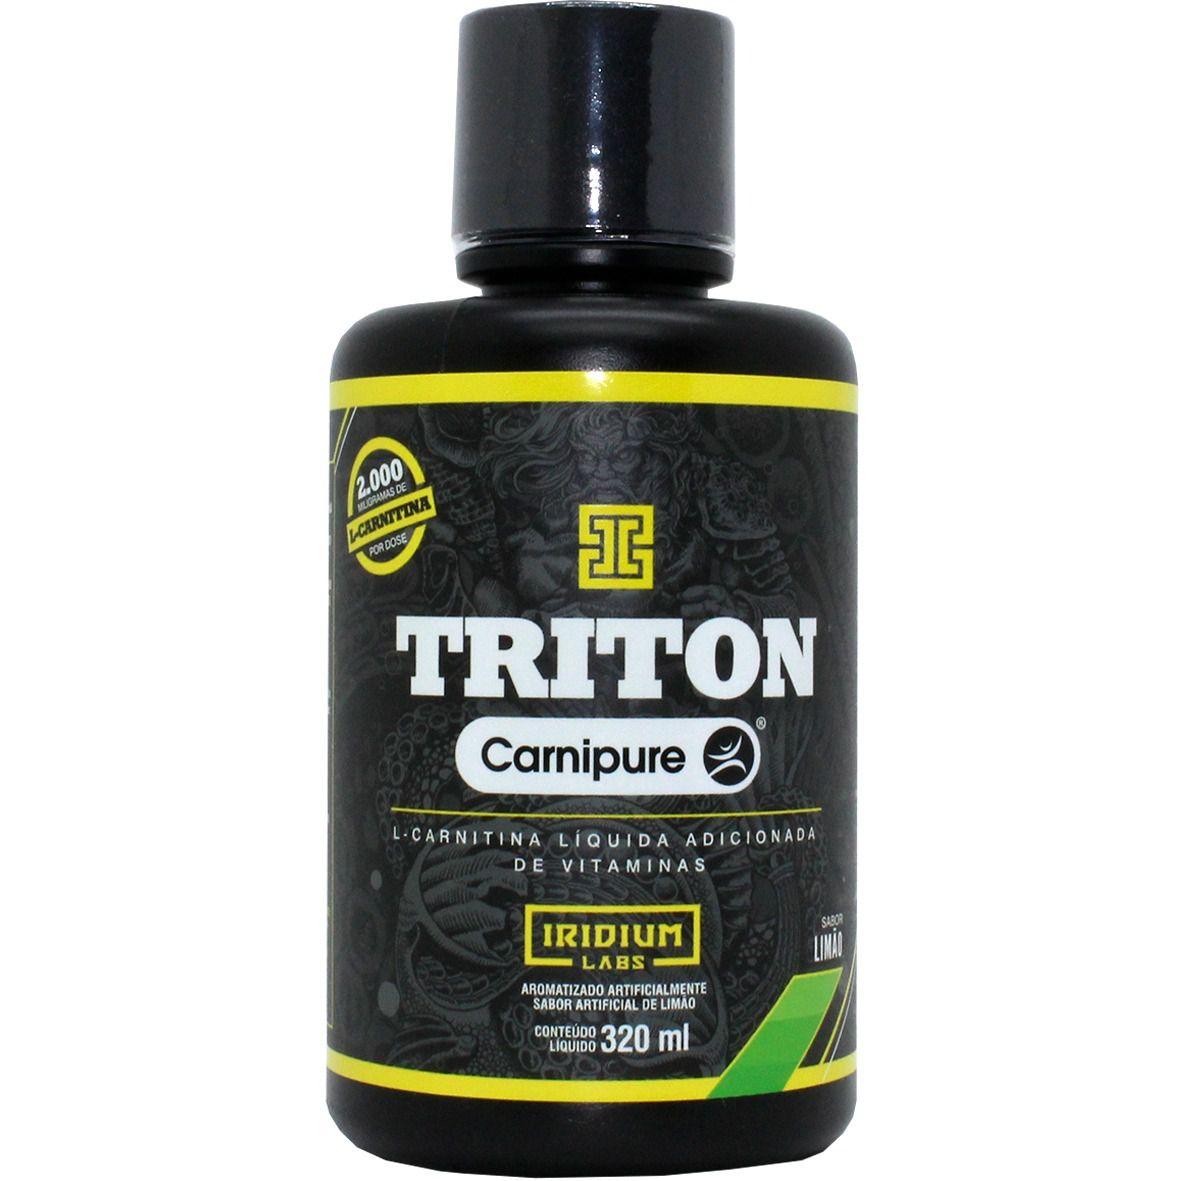 Triton Carnipure Iridium Labs